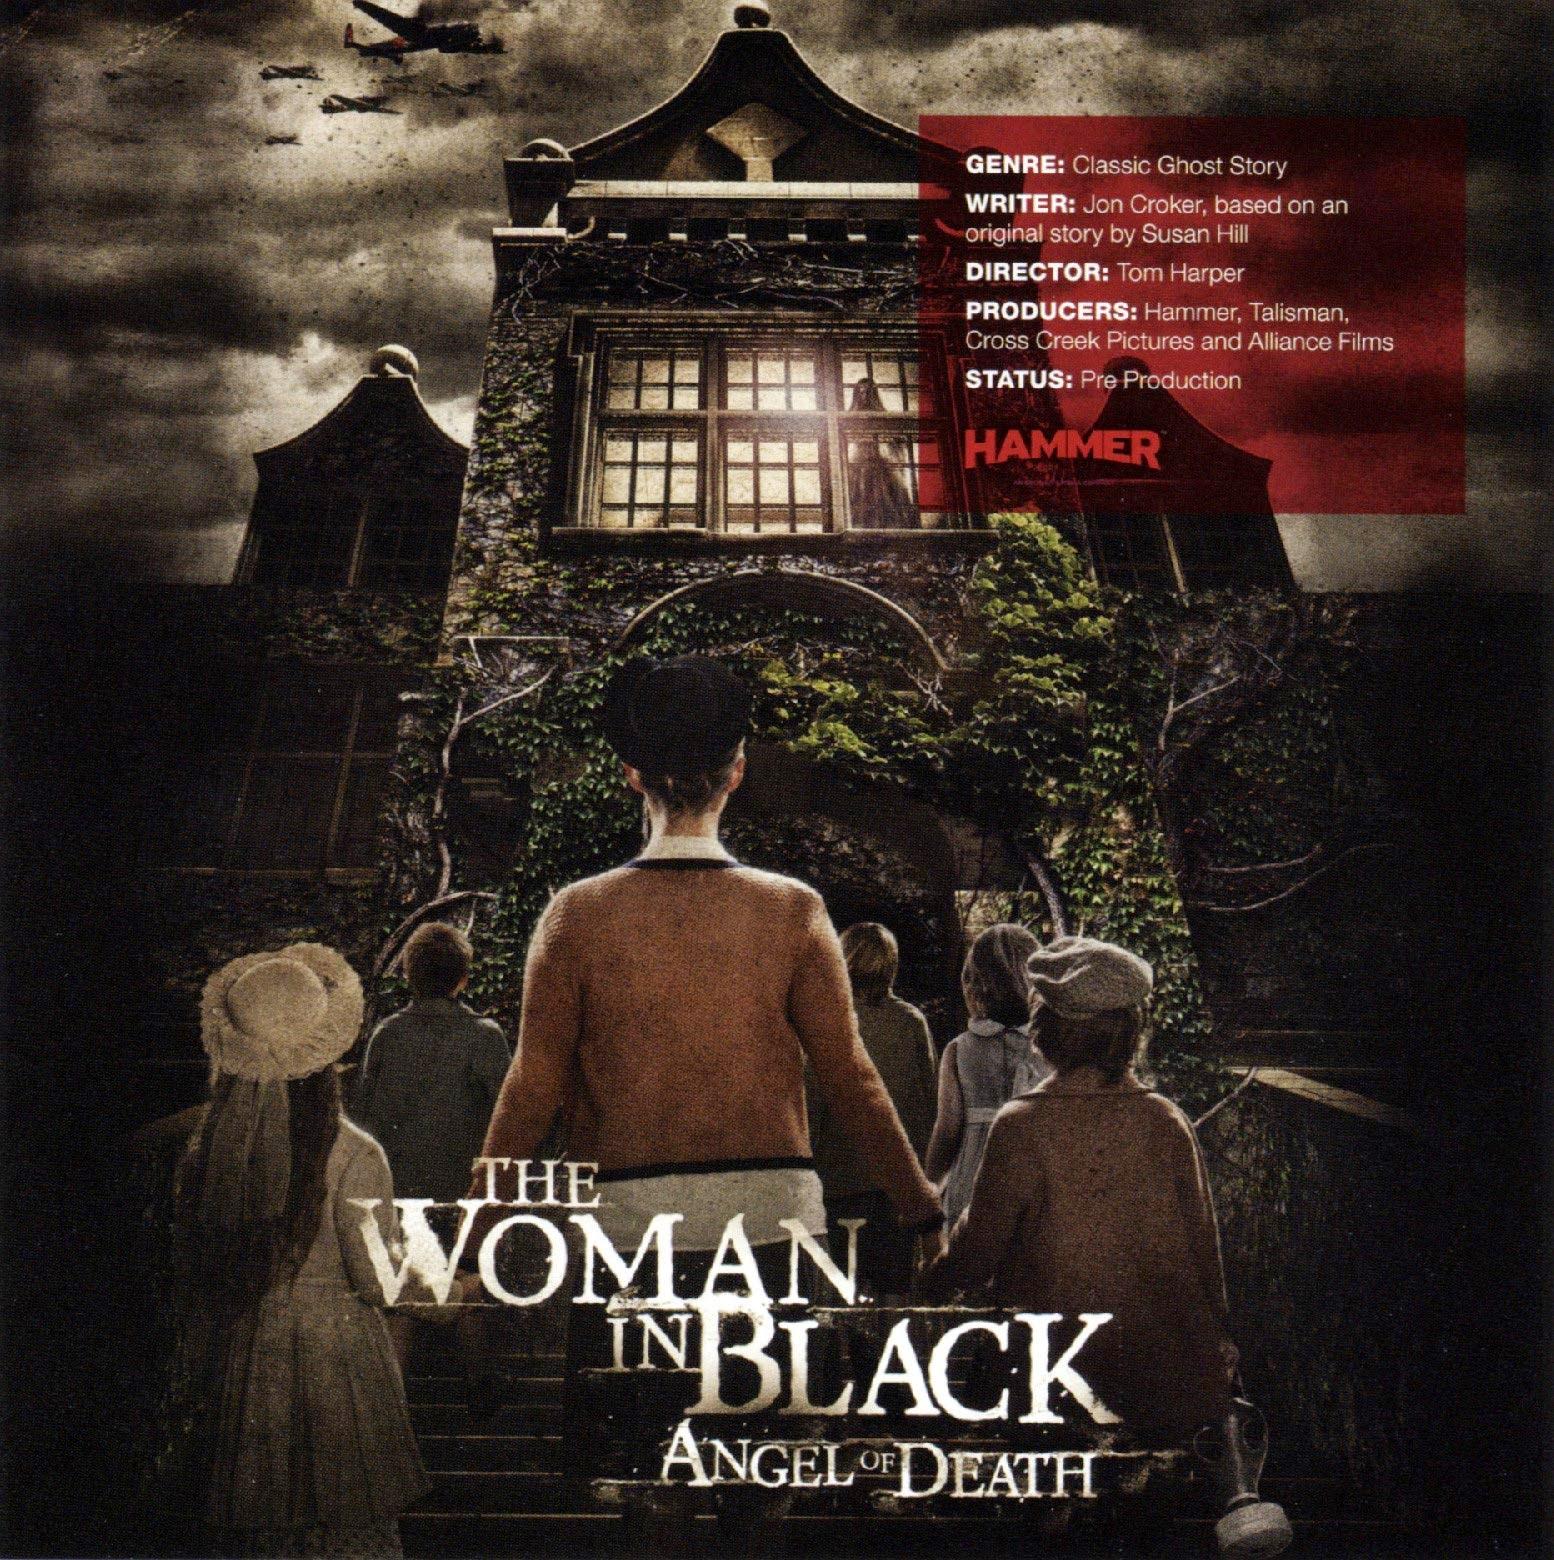 movie wallpaper hd the woman in black 2 angel of death